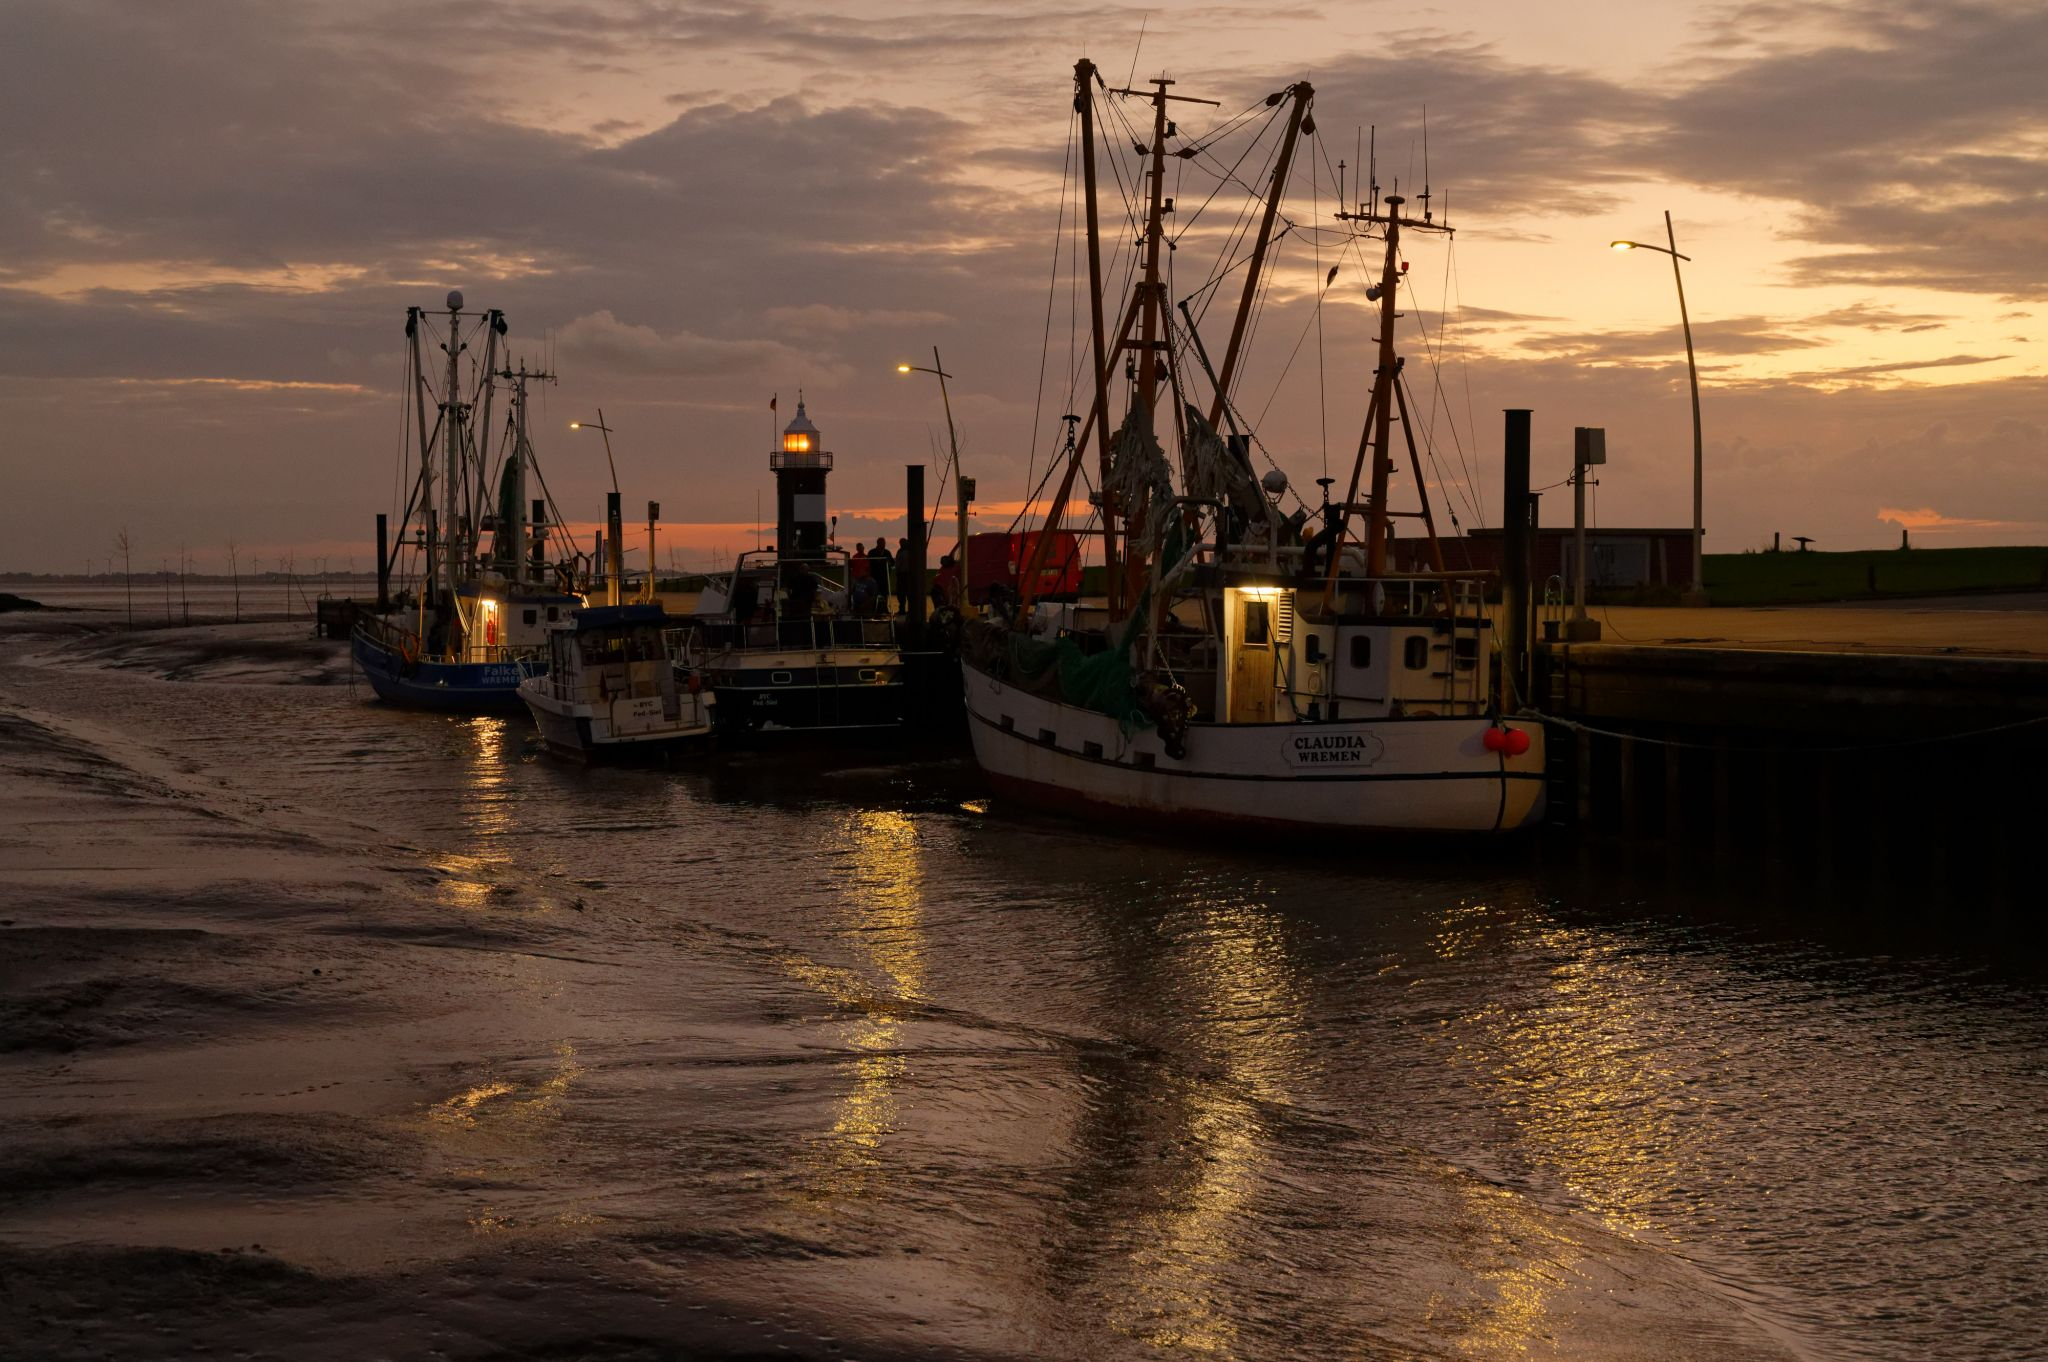 Wremen Sluice / Cutter Harbour, Germany